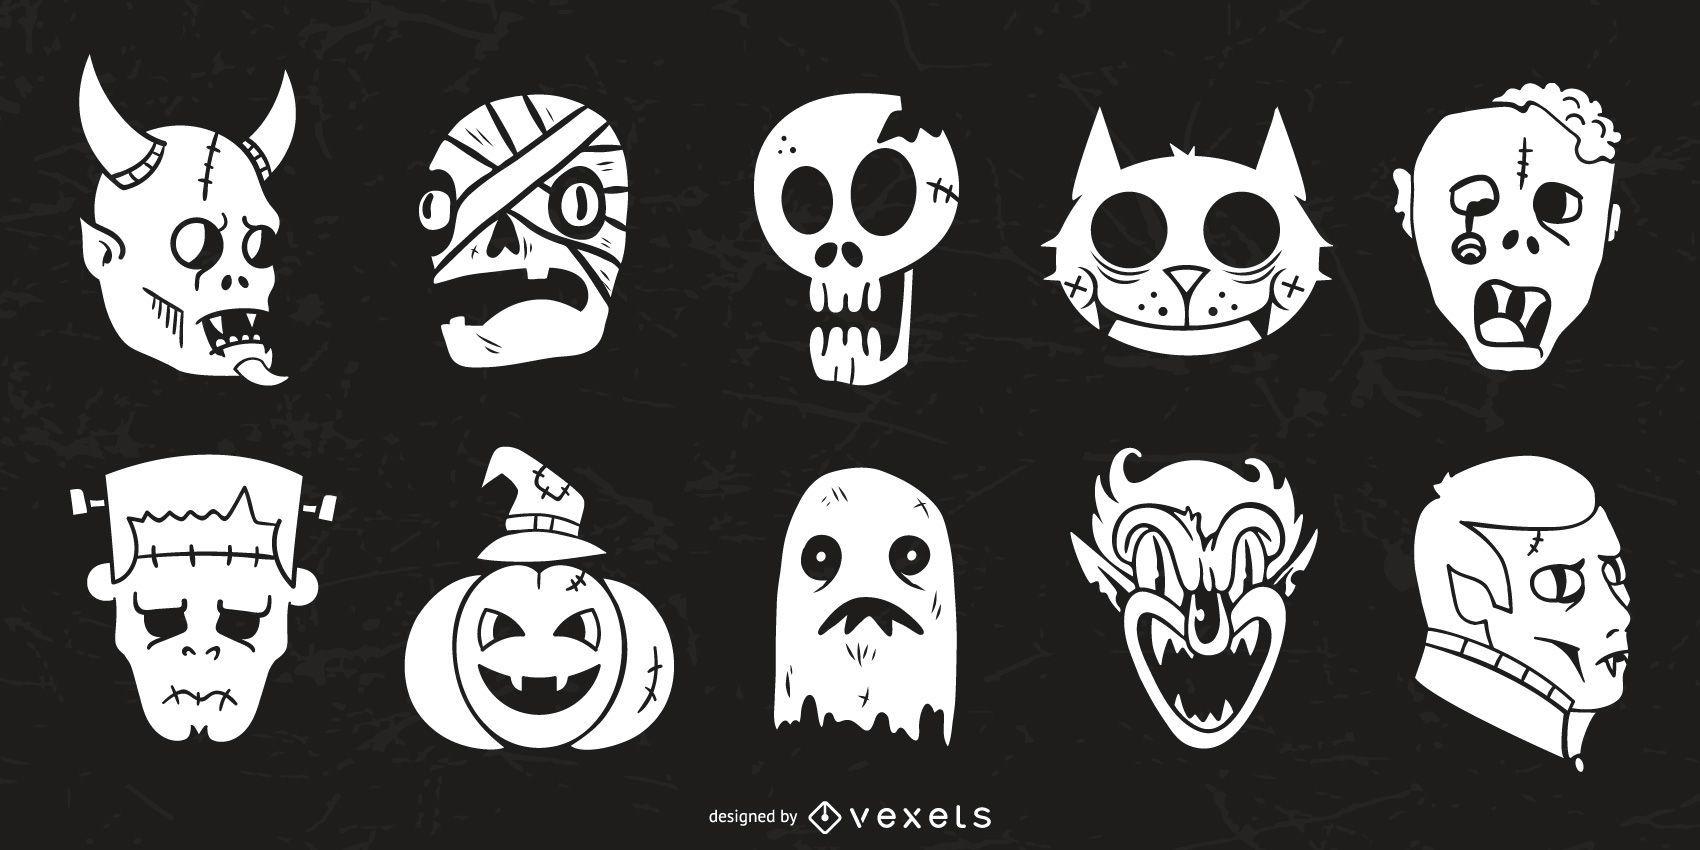 Colecci?n de silueta de personajes de Halloween